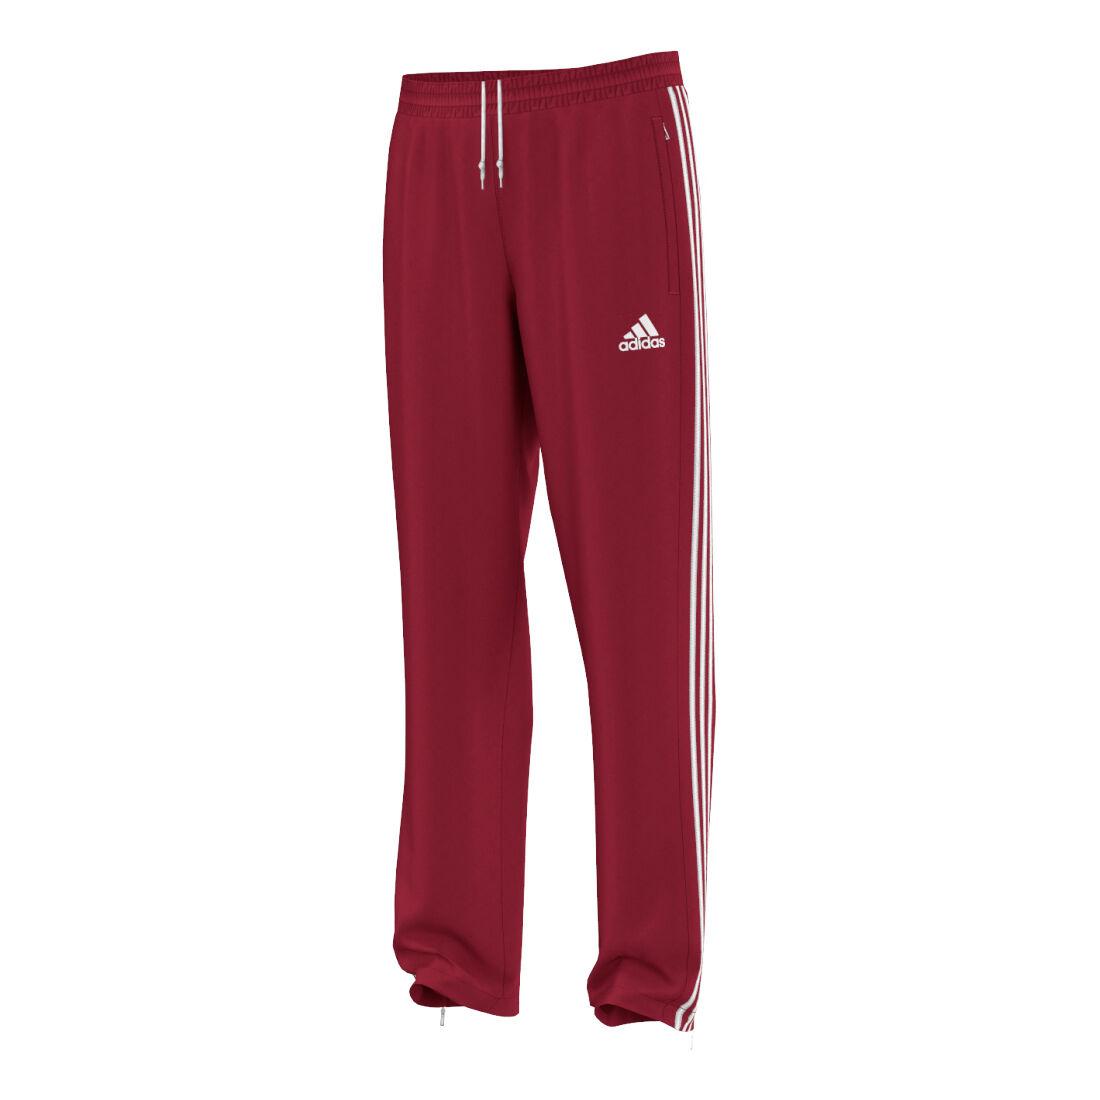 adidas T16 Team Pant Trainingshose Herren Rot, Weiß online